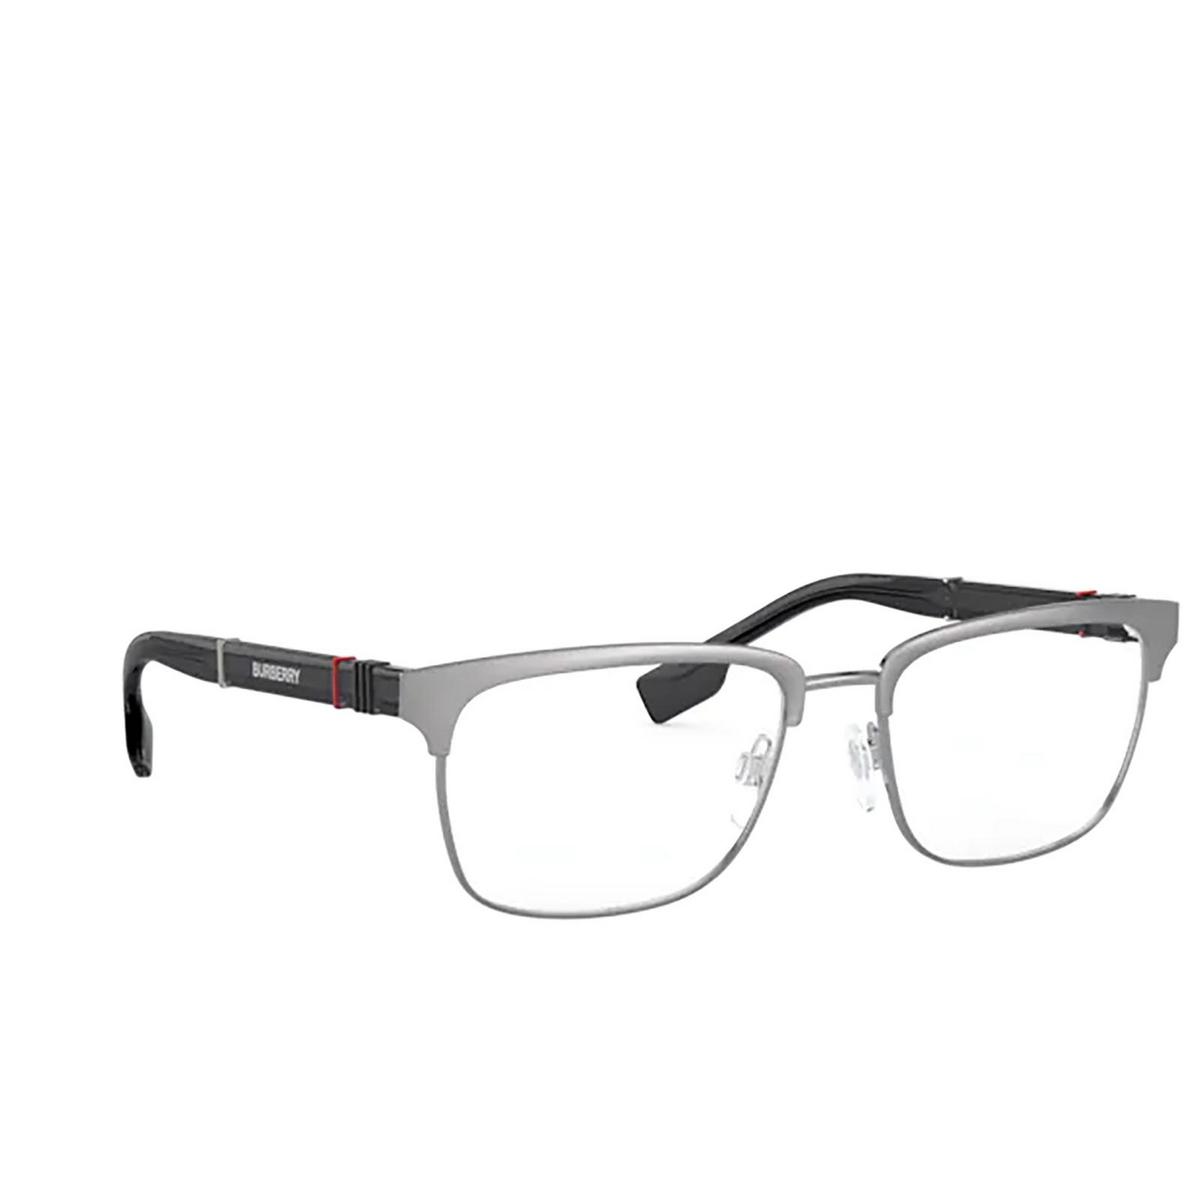 Burberry® Rectangle Eyeglasses: Alba BE1348 color Brushed Gunmetal 1008 - three-quarters view.